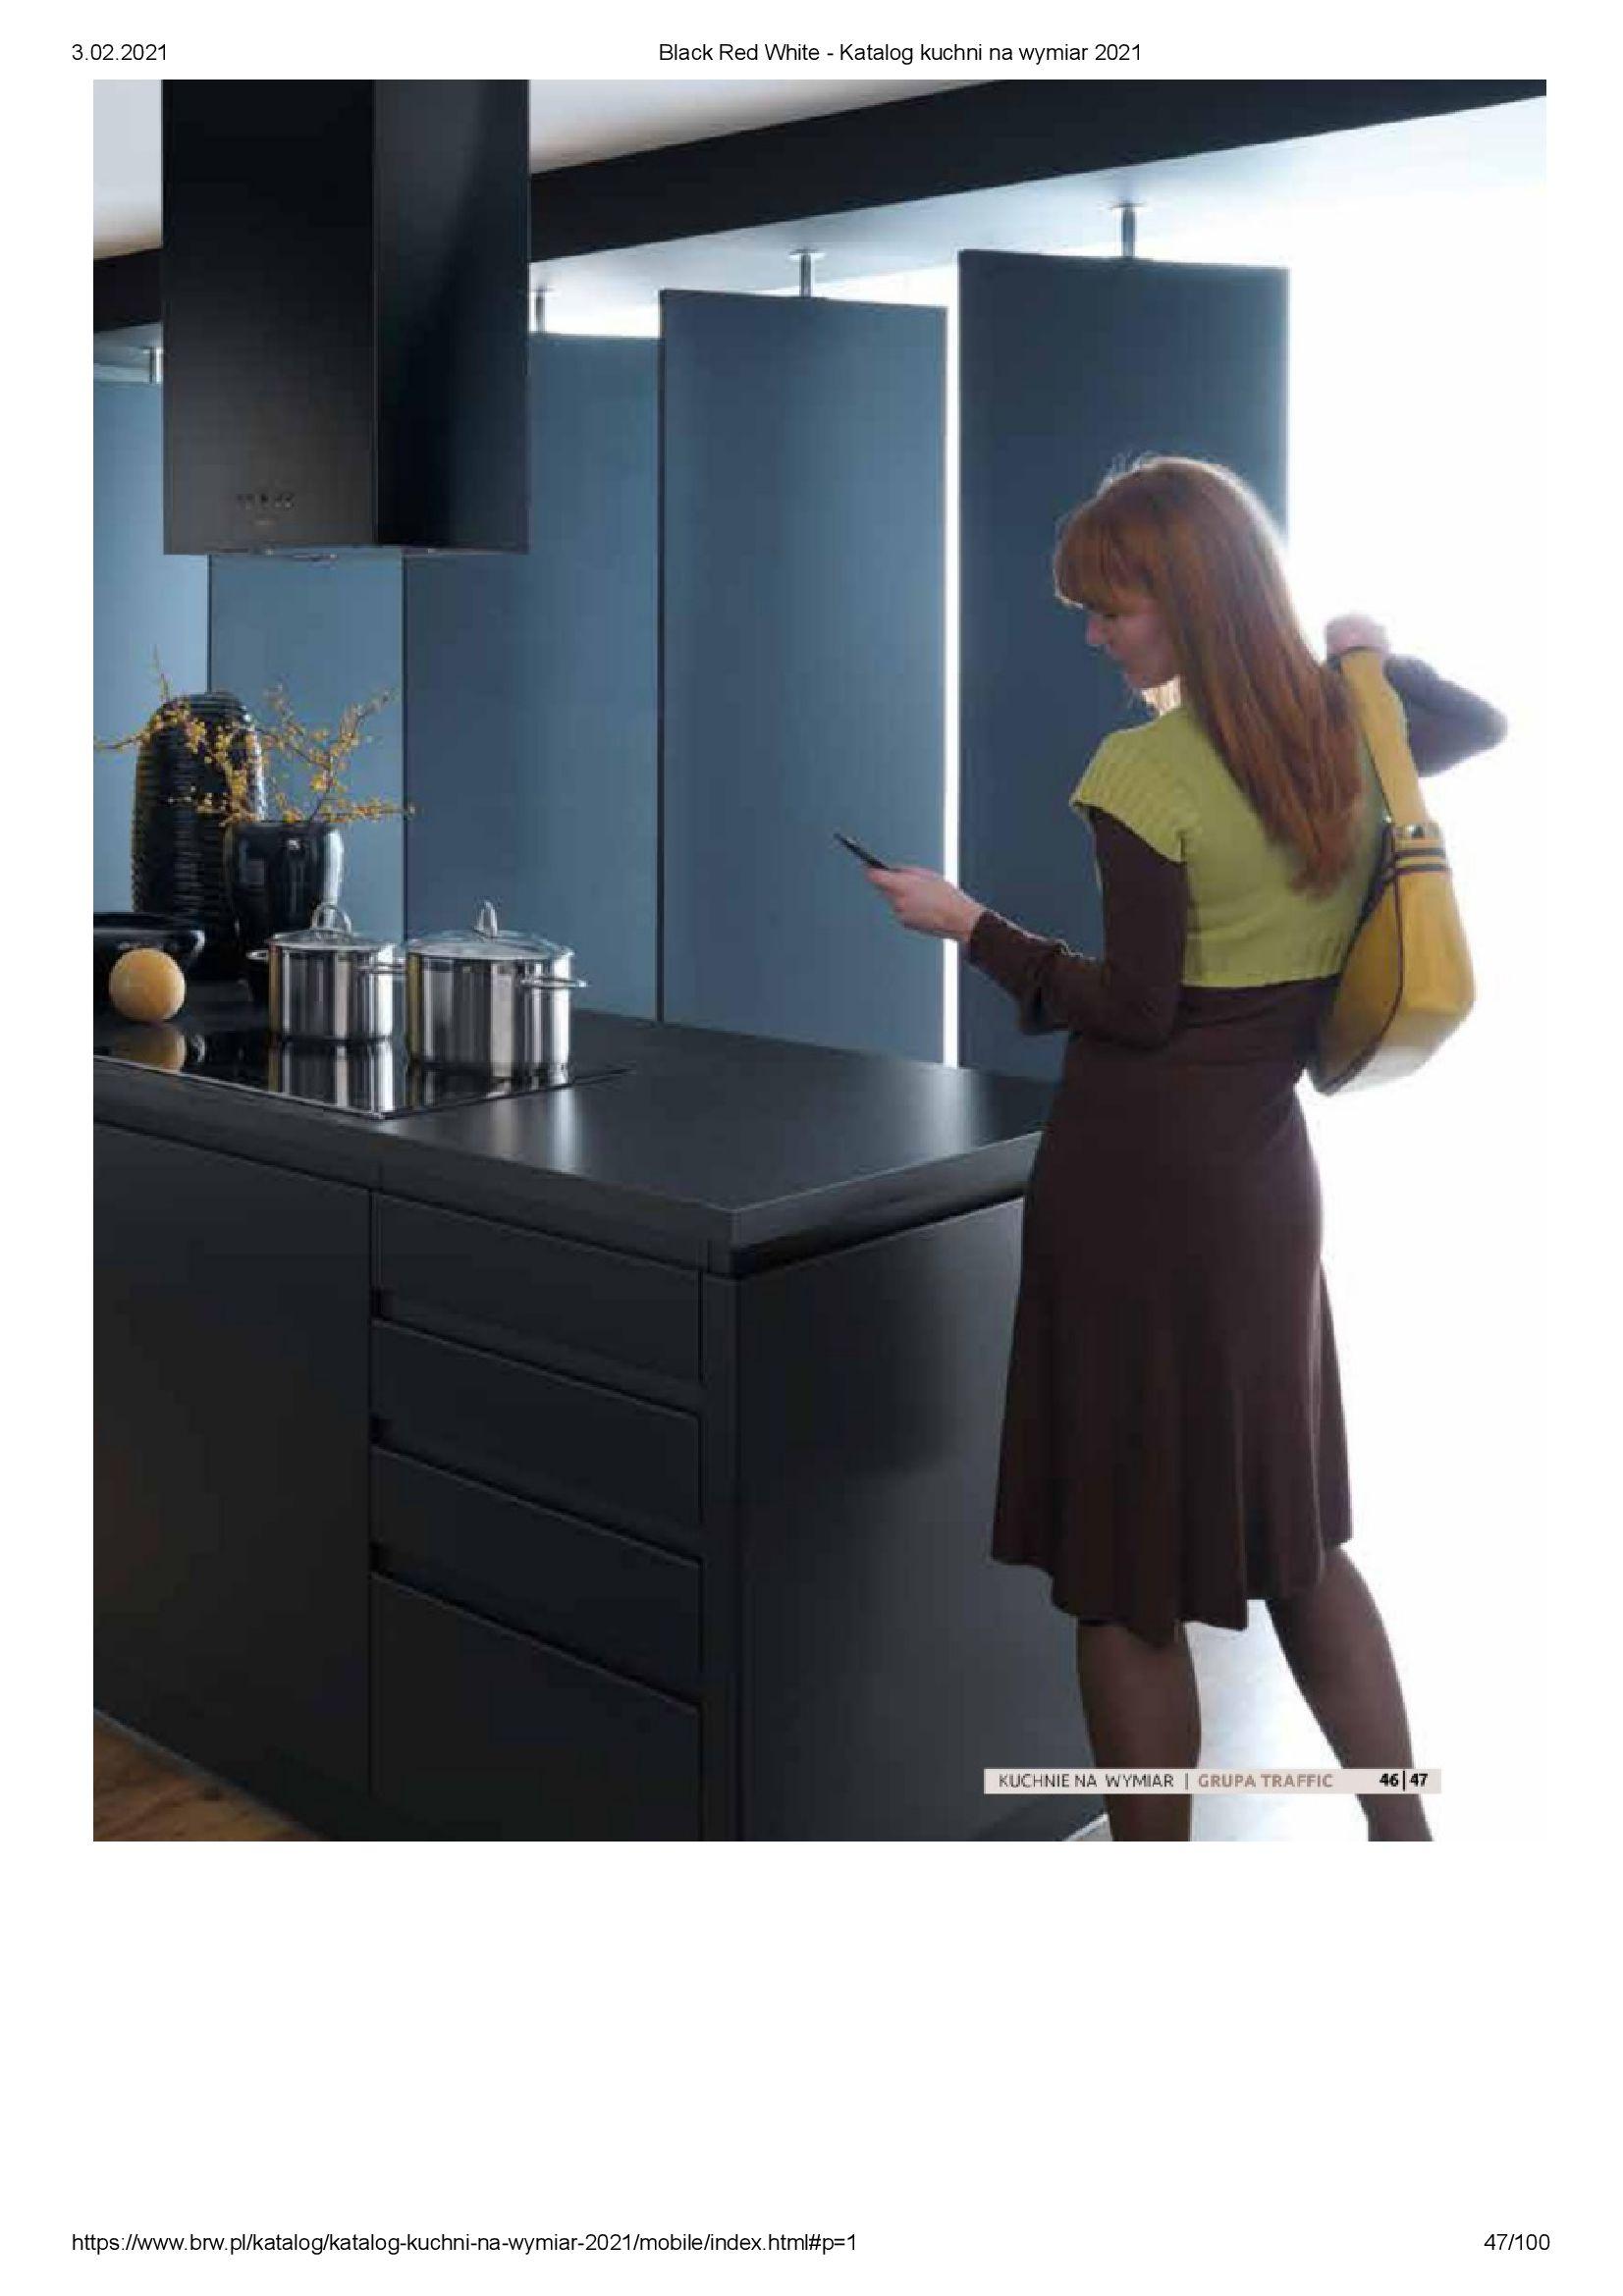 Gazetka Black Red White: Katalog - Kuchnie na wymiar Senso Kitchens 2021 2021-01-01 page-47